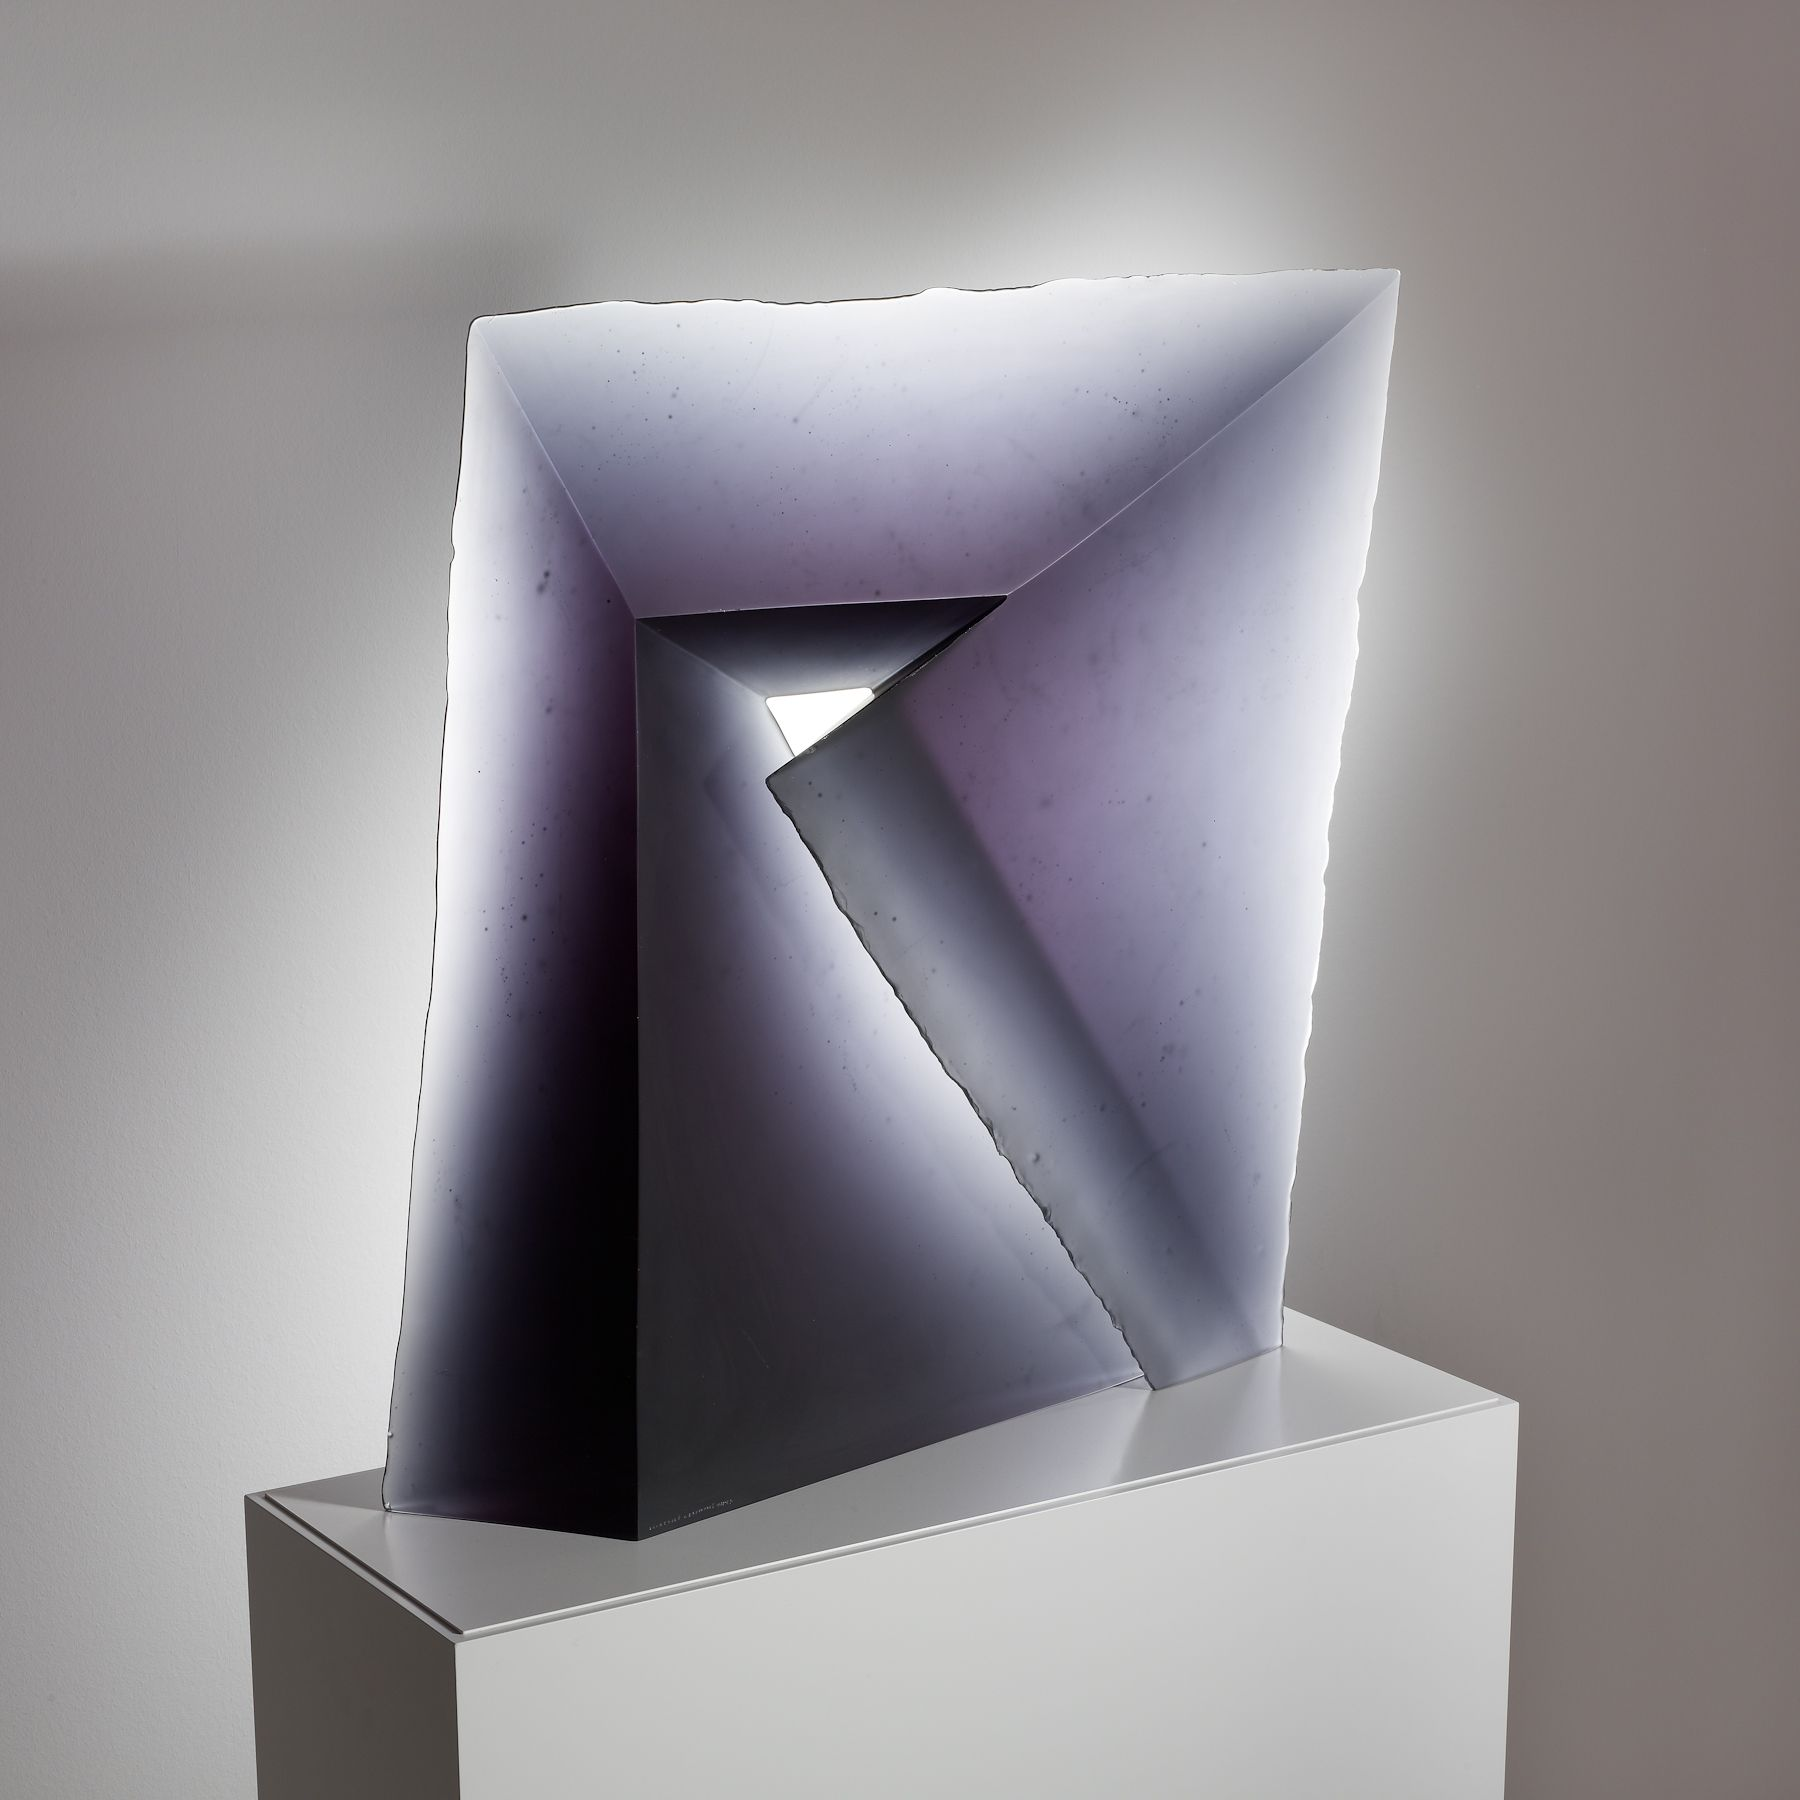 """Diagonale""; Entwurf Stanislav Libenský, Ausführung Jaroslava Brychtová, Zelezný Brod, Tschechoslowakei, 1989; Blauviolettes Glas, formgeschmolzen, geschliffen; 75 x 70 cm"